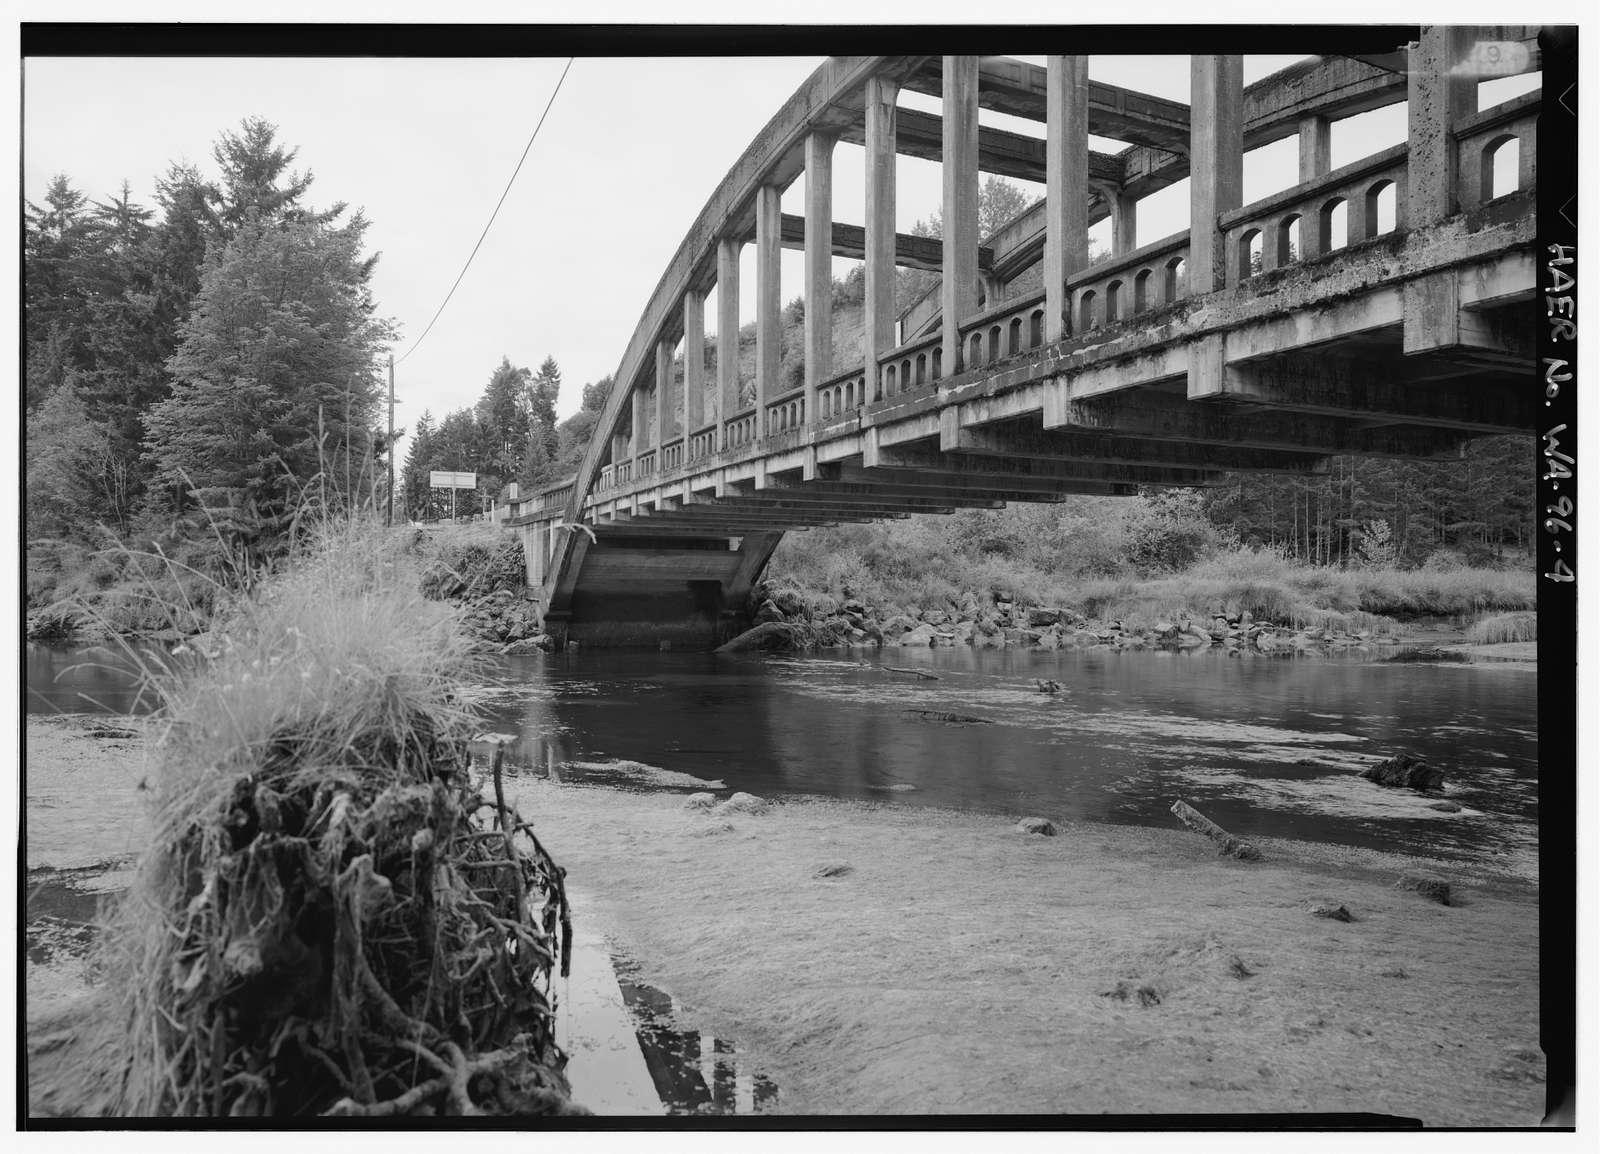 South Hamma Hamma River Bridge, Spanning Hamma Hamma River at U.S. Route 101, Eldon, Mason County, WA